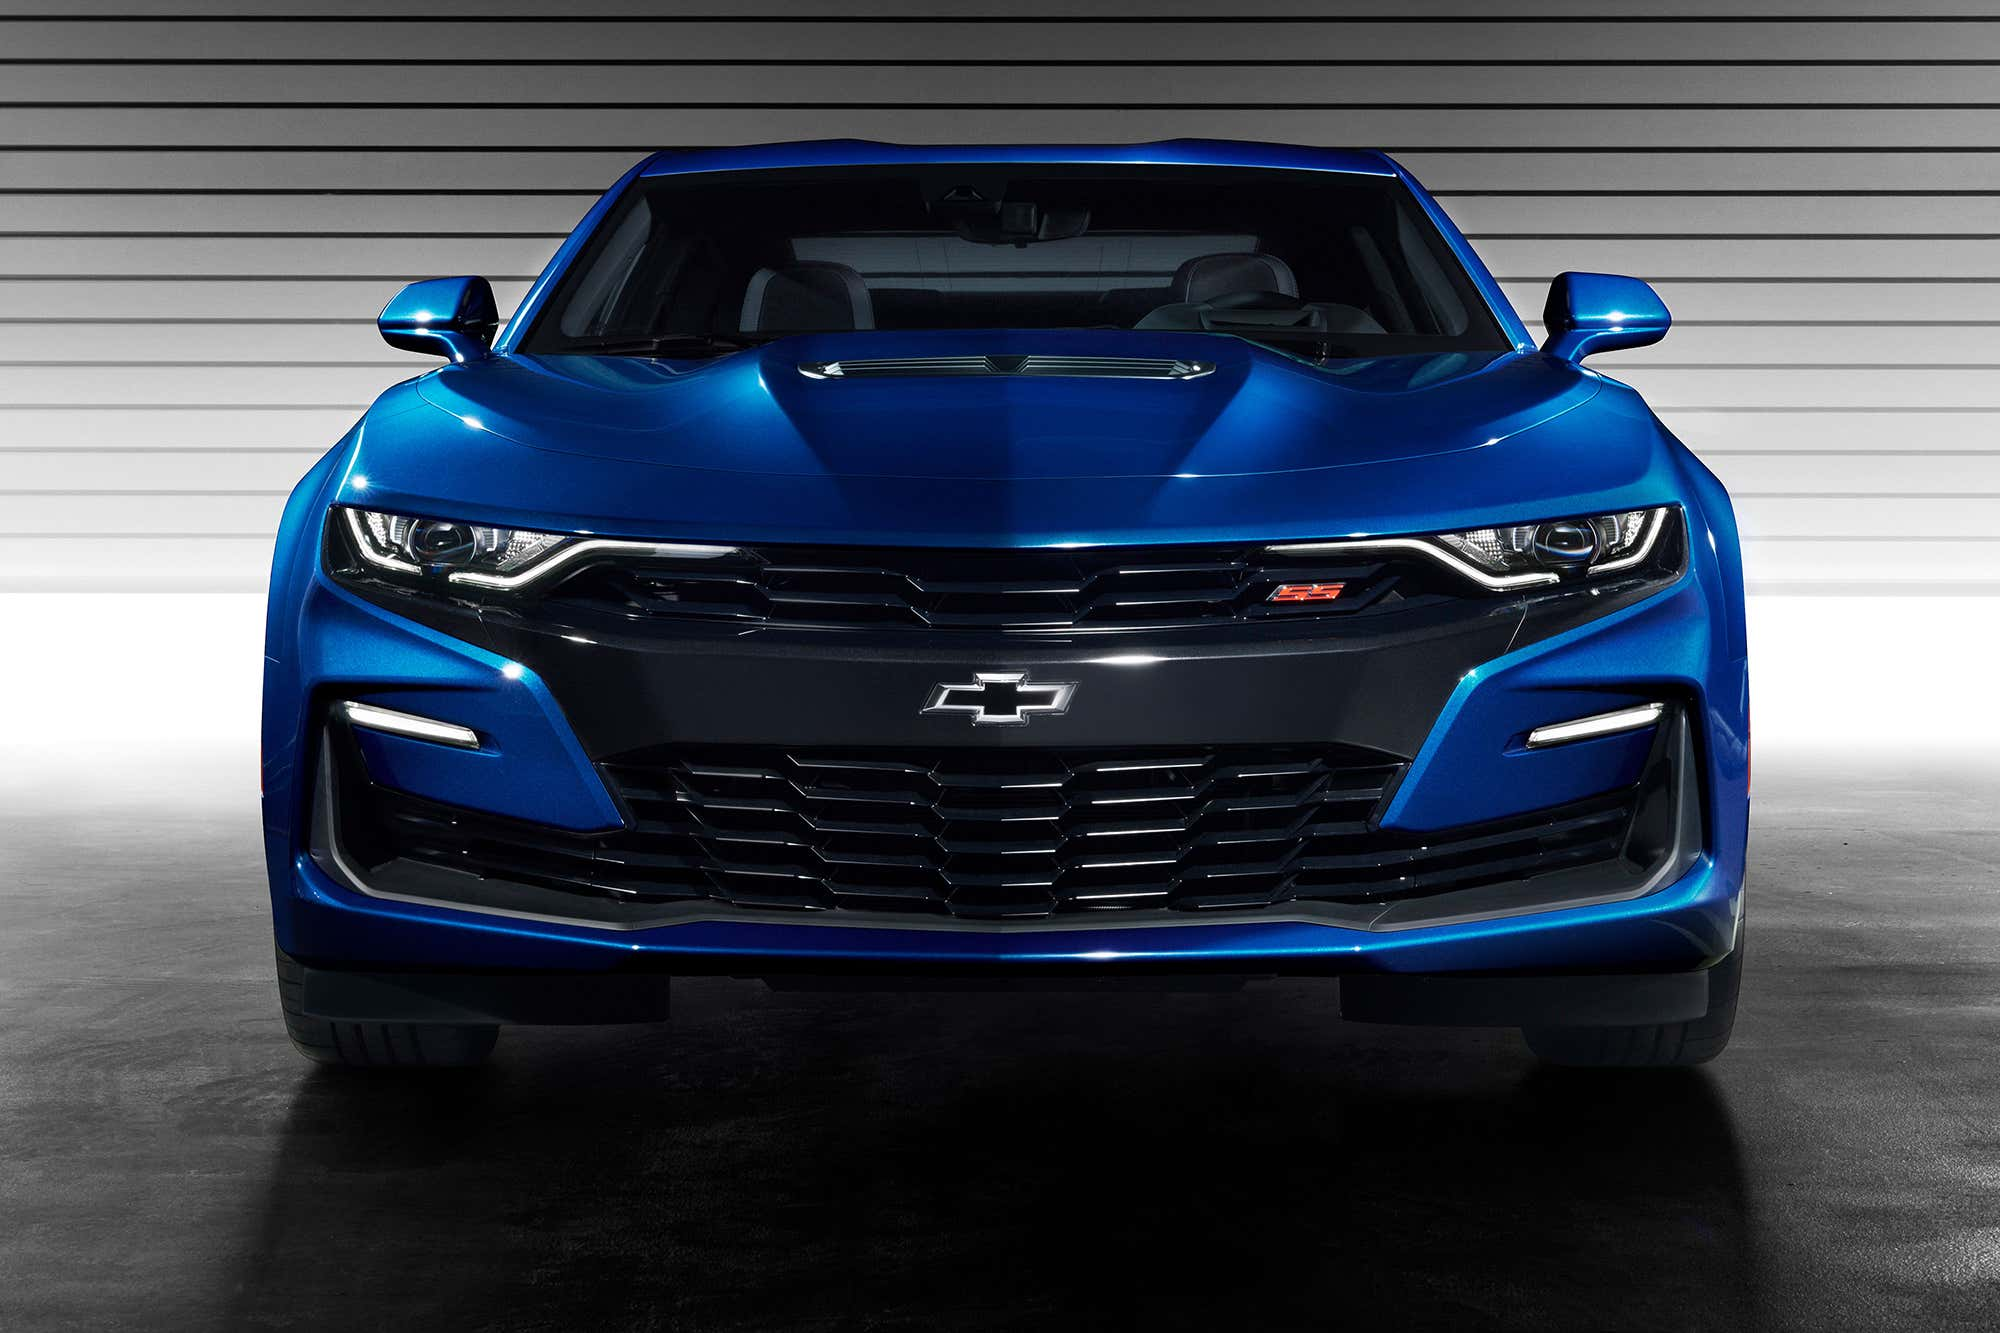 2020 Camaro Ss New Concept